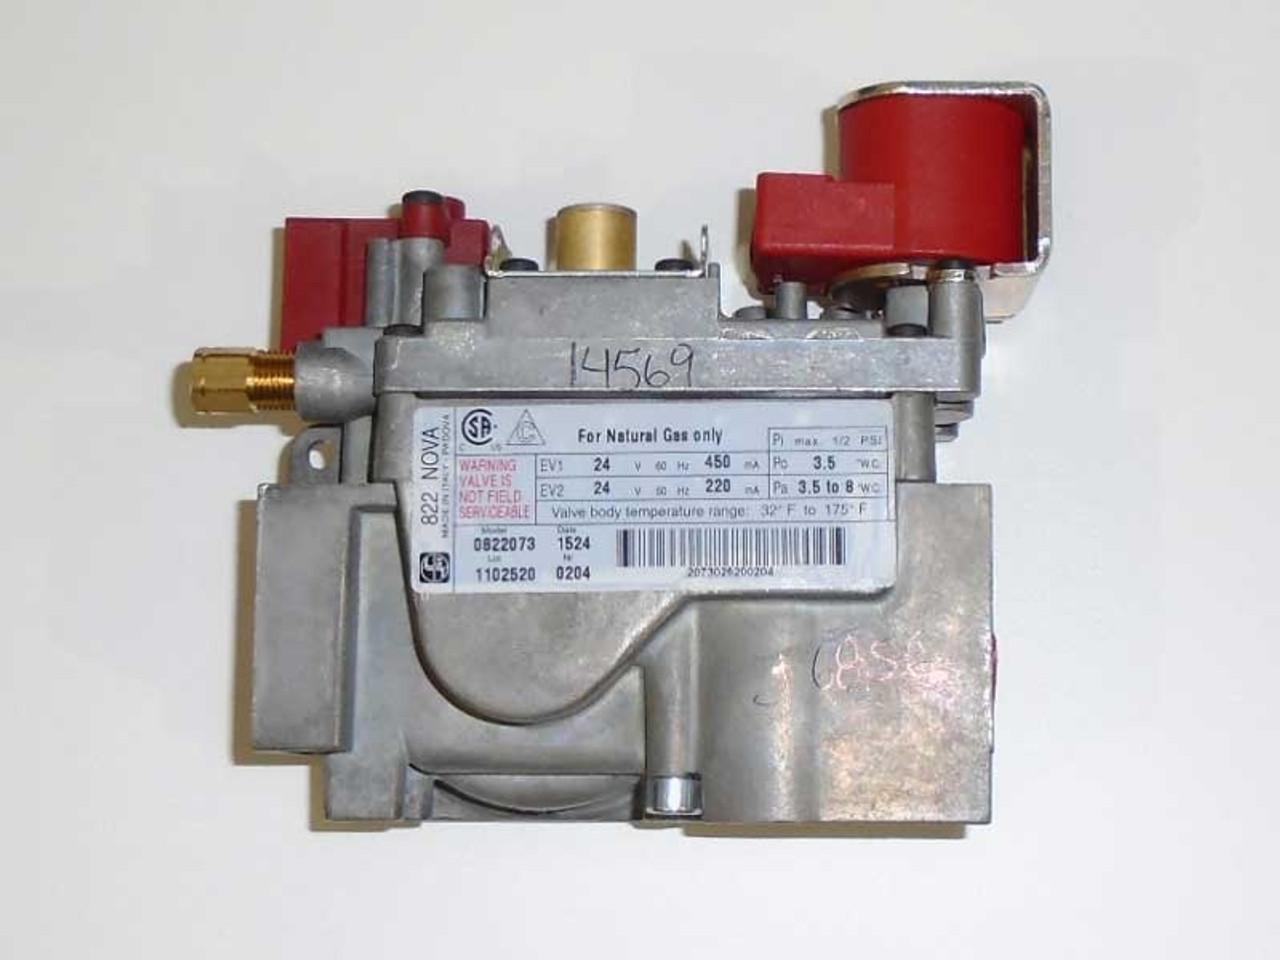 Fmi Gas Fireplace Electronic Sit Gas Valve Ng 14569